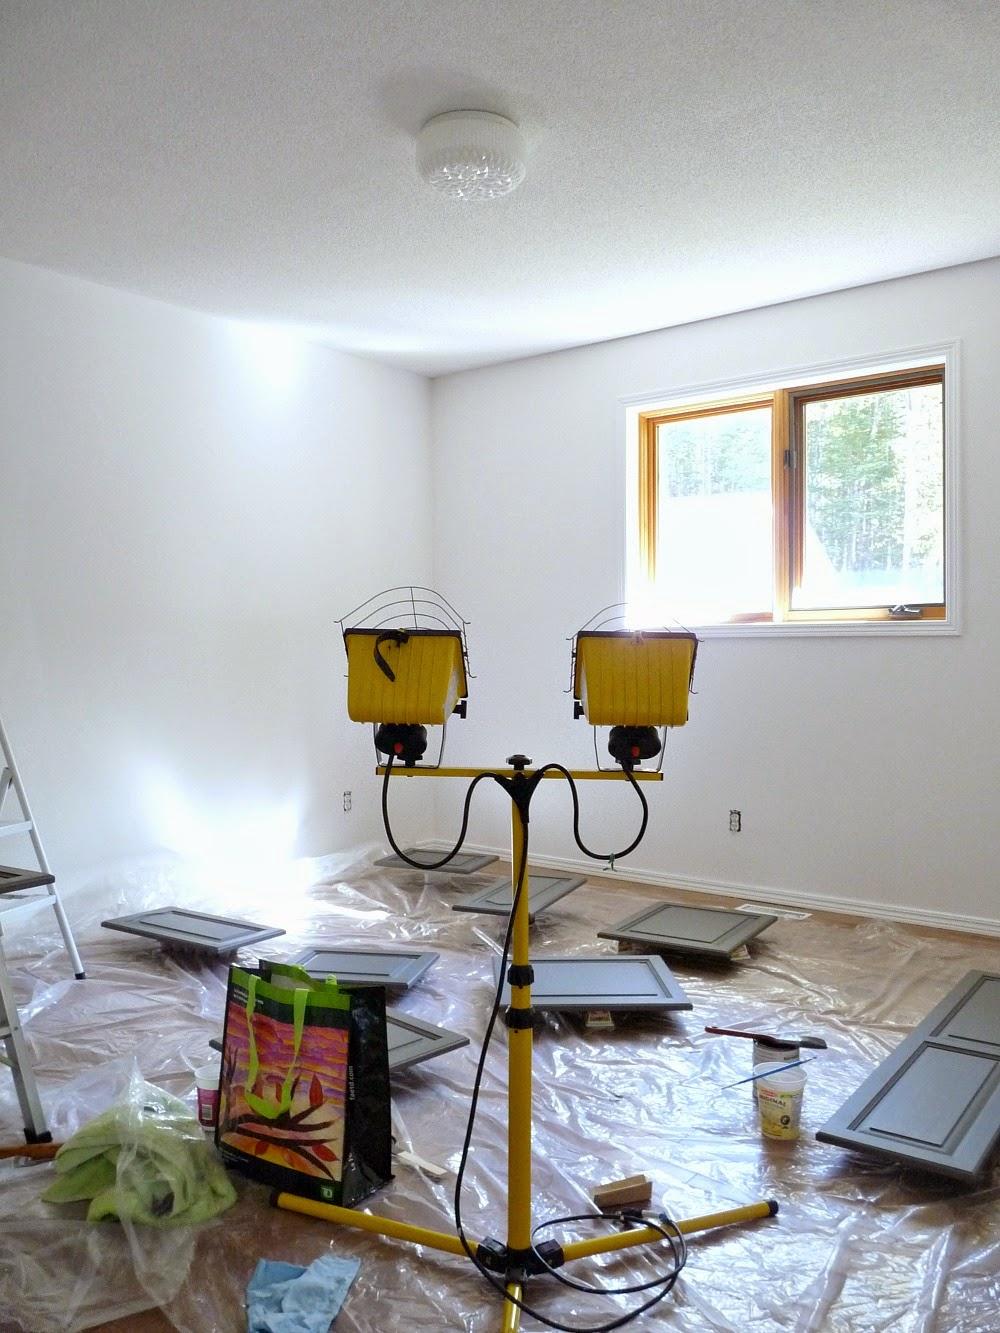 Refinishing Cabinetry